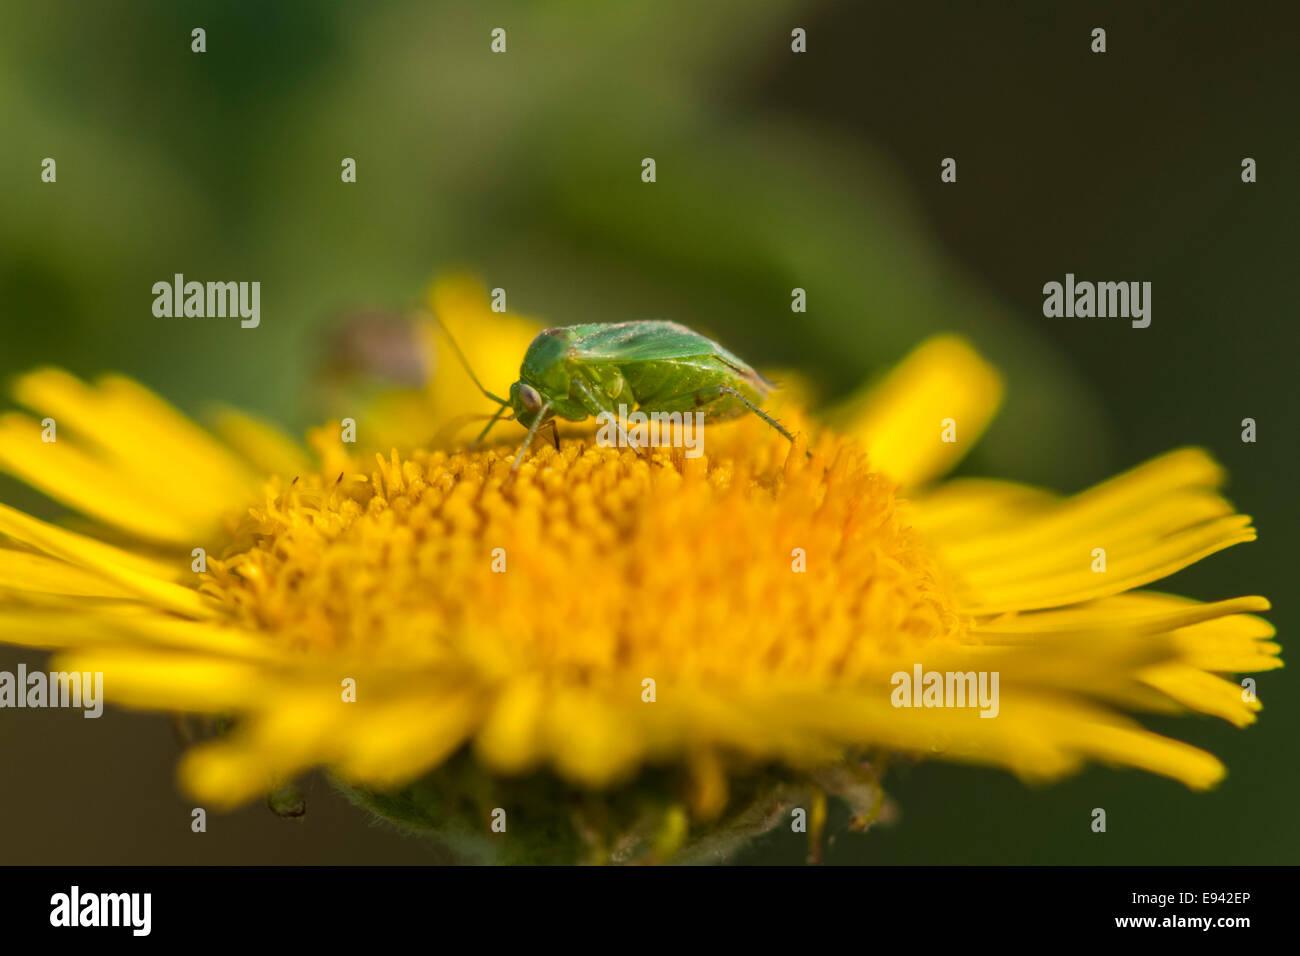 A macro shot of a Common Green Capsid, Lygocoris pabulinus, feeding on a yellow flower - Stock Image